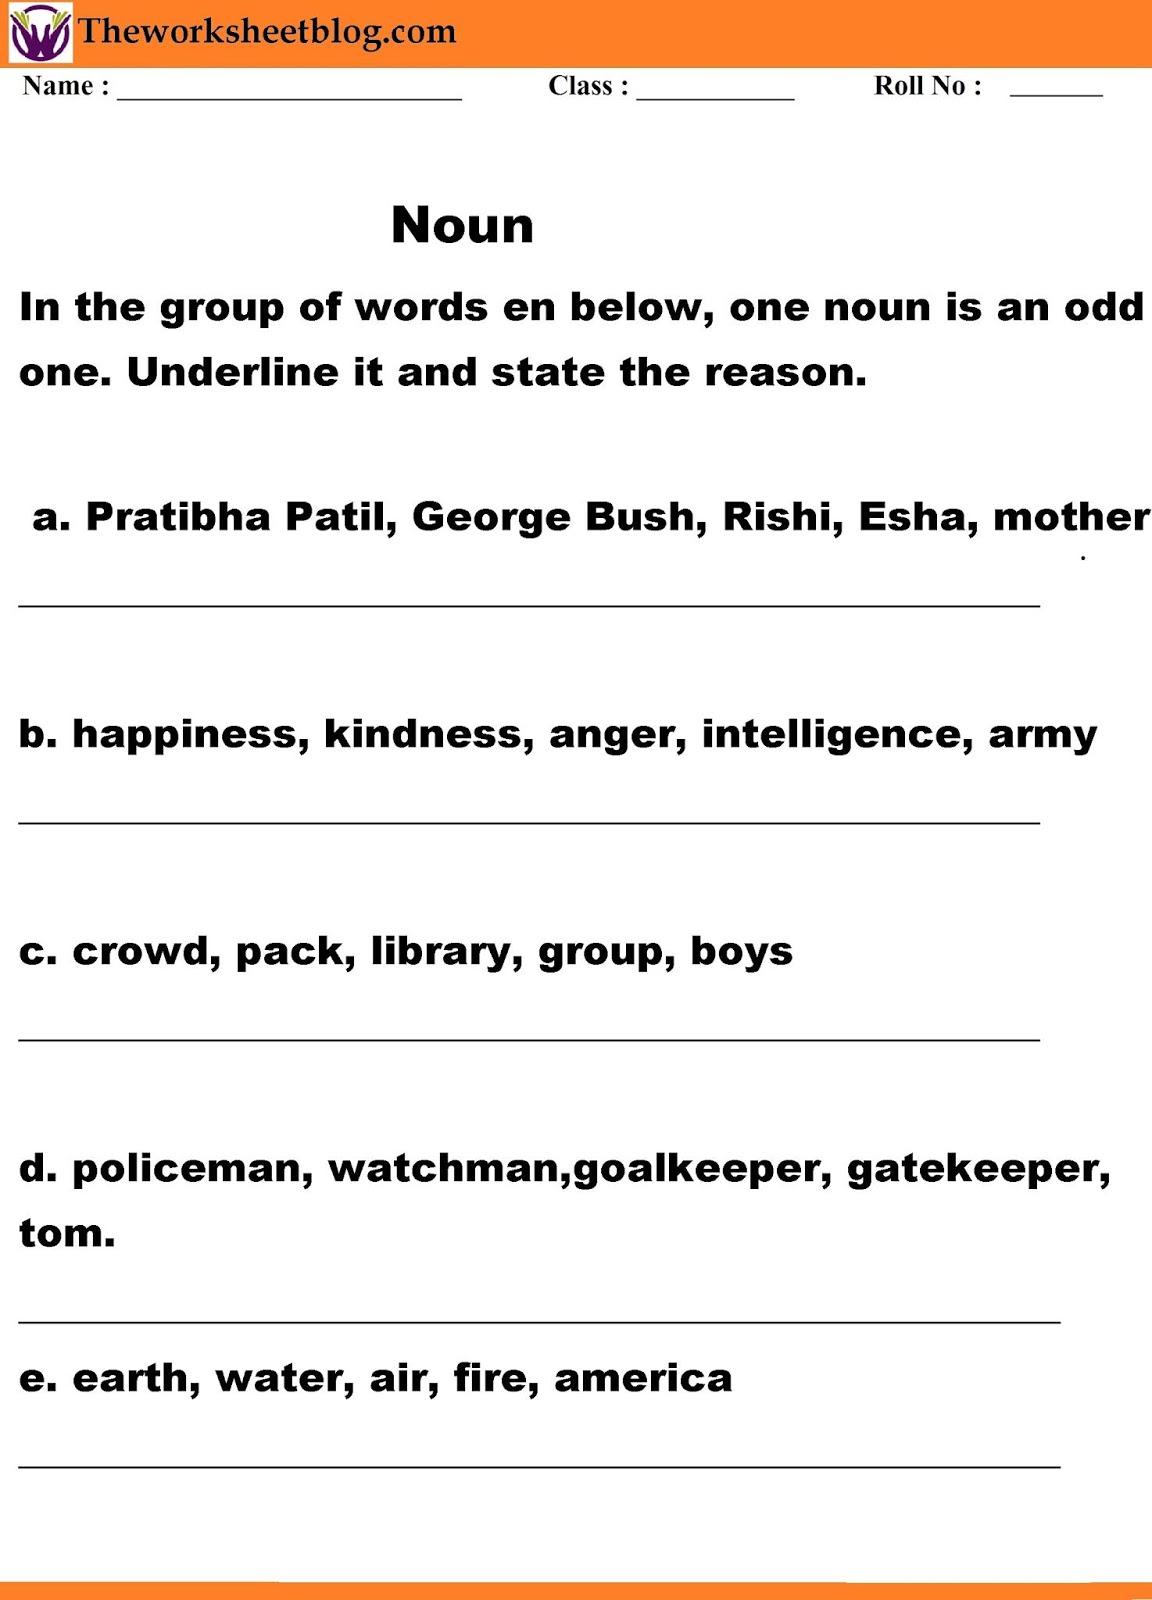 hight resolution of Noun Worksheets - Theworksheetsblog